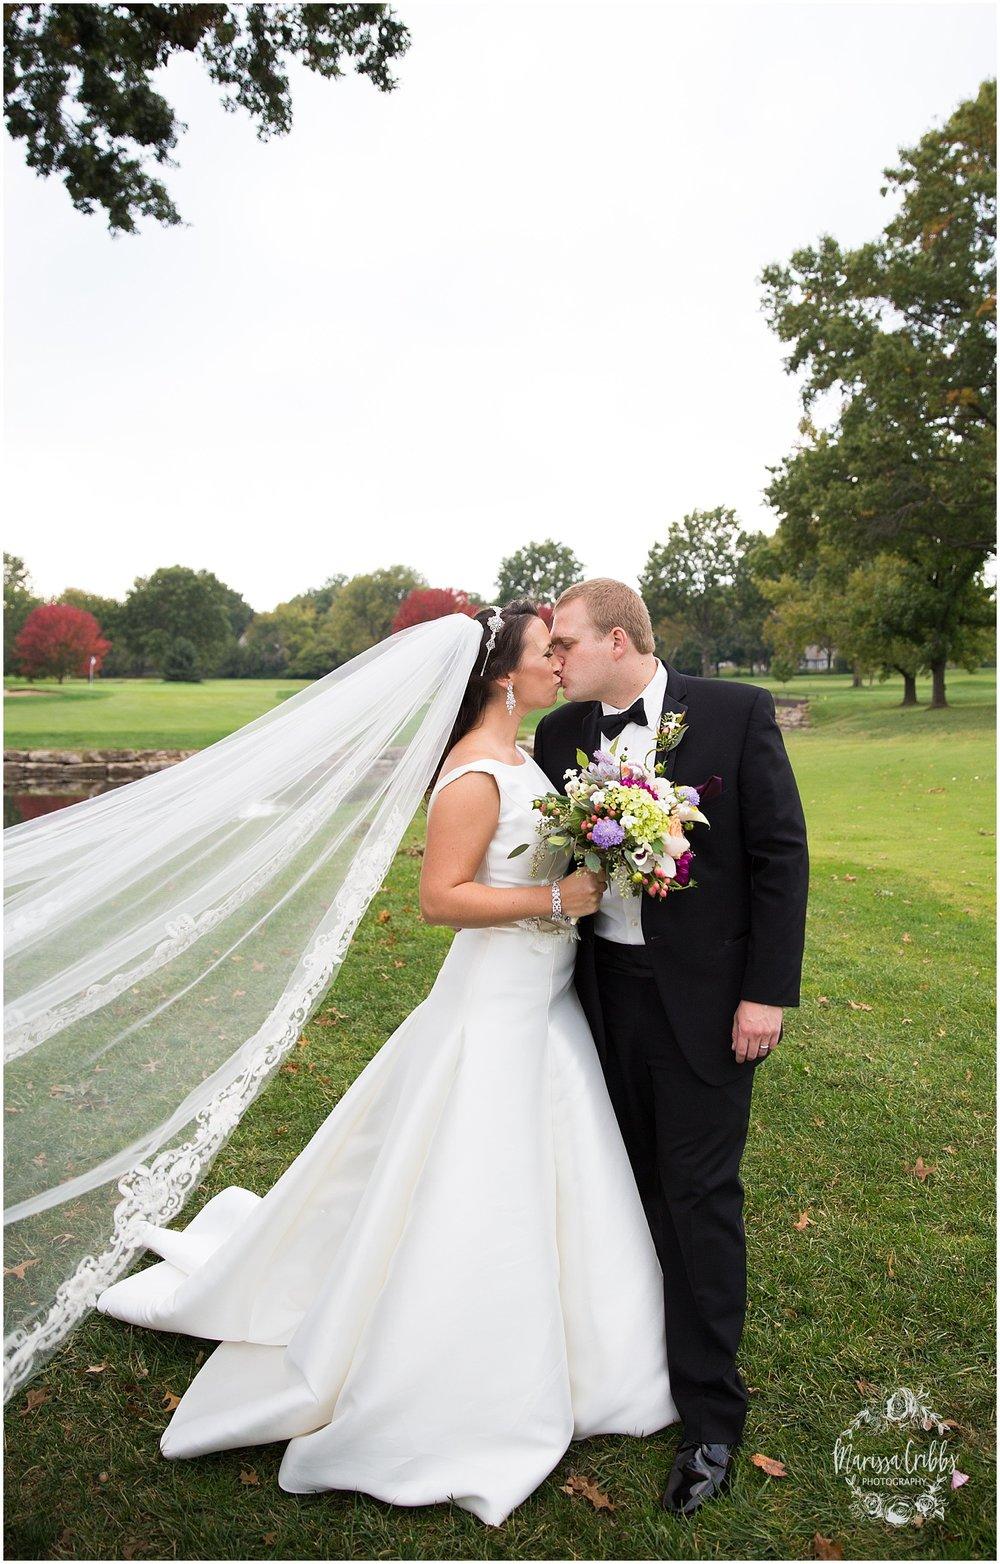 Blue Hills Country Club Wedding | Marissa Cribbs Photography | Nolte's Bridal | KC Wedding Photographer | KC Weddings_1193.jpg